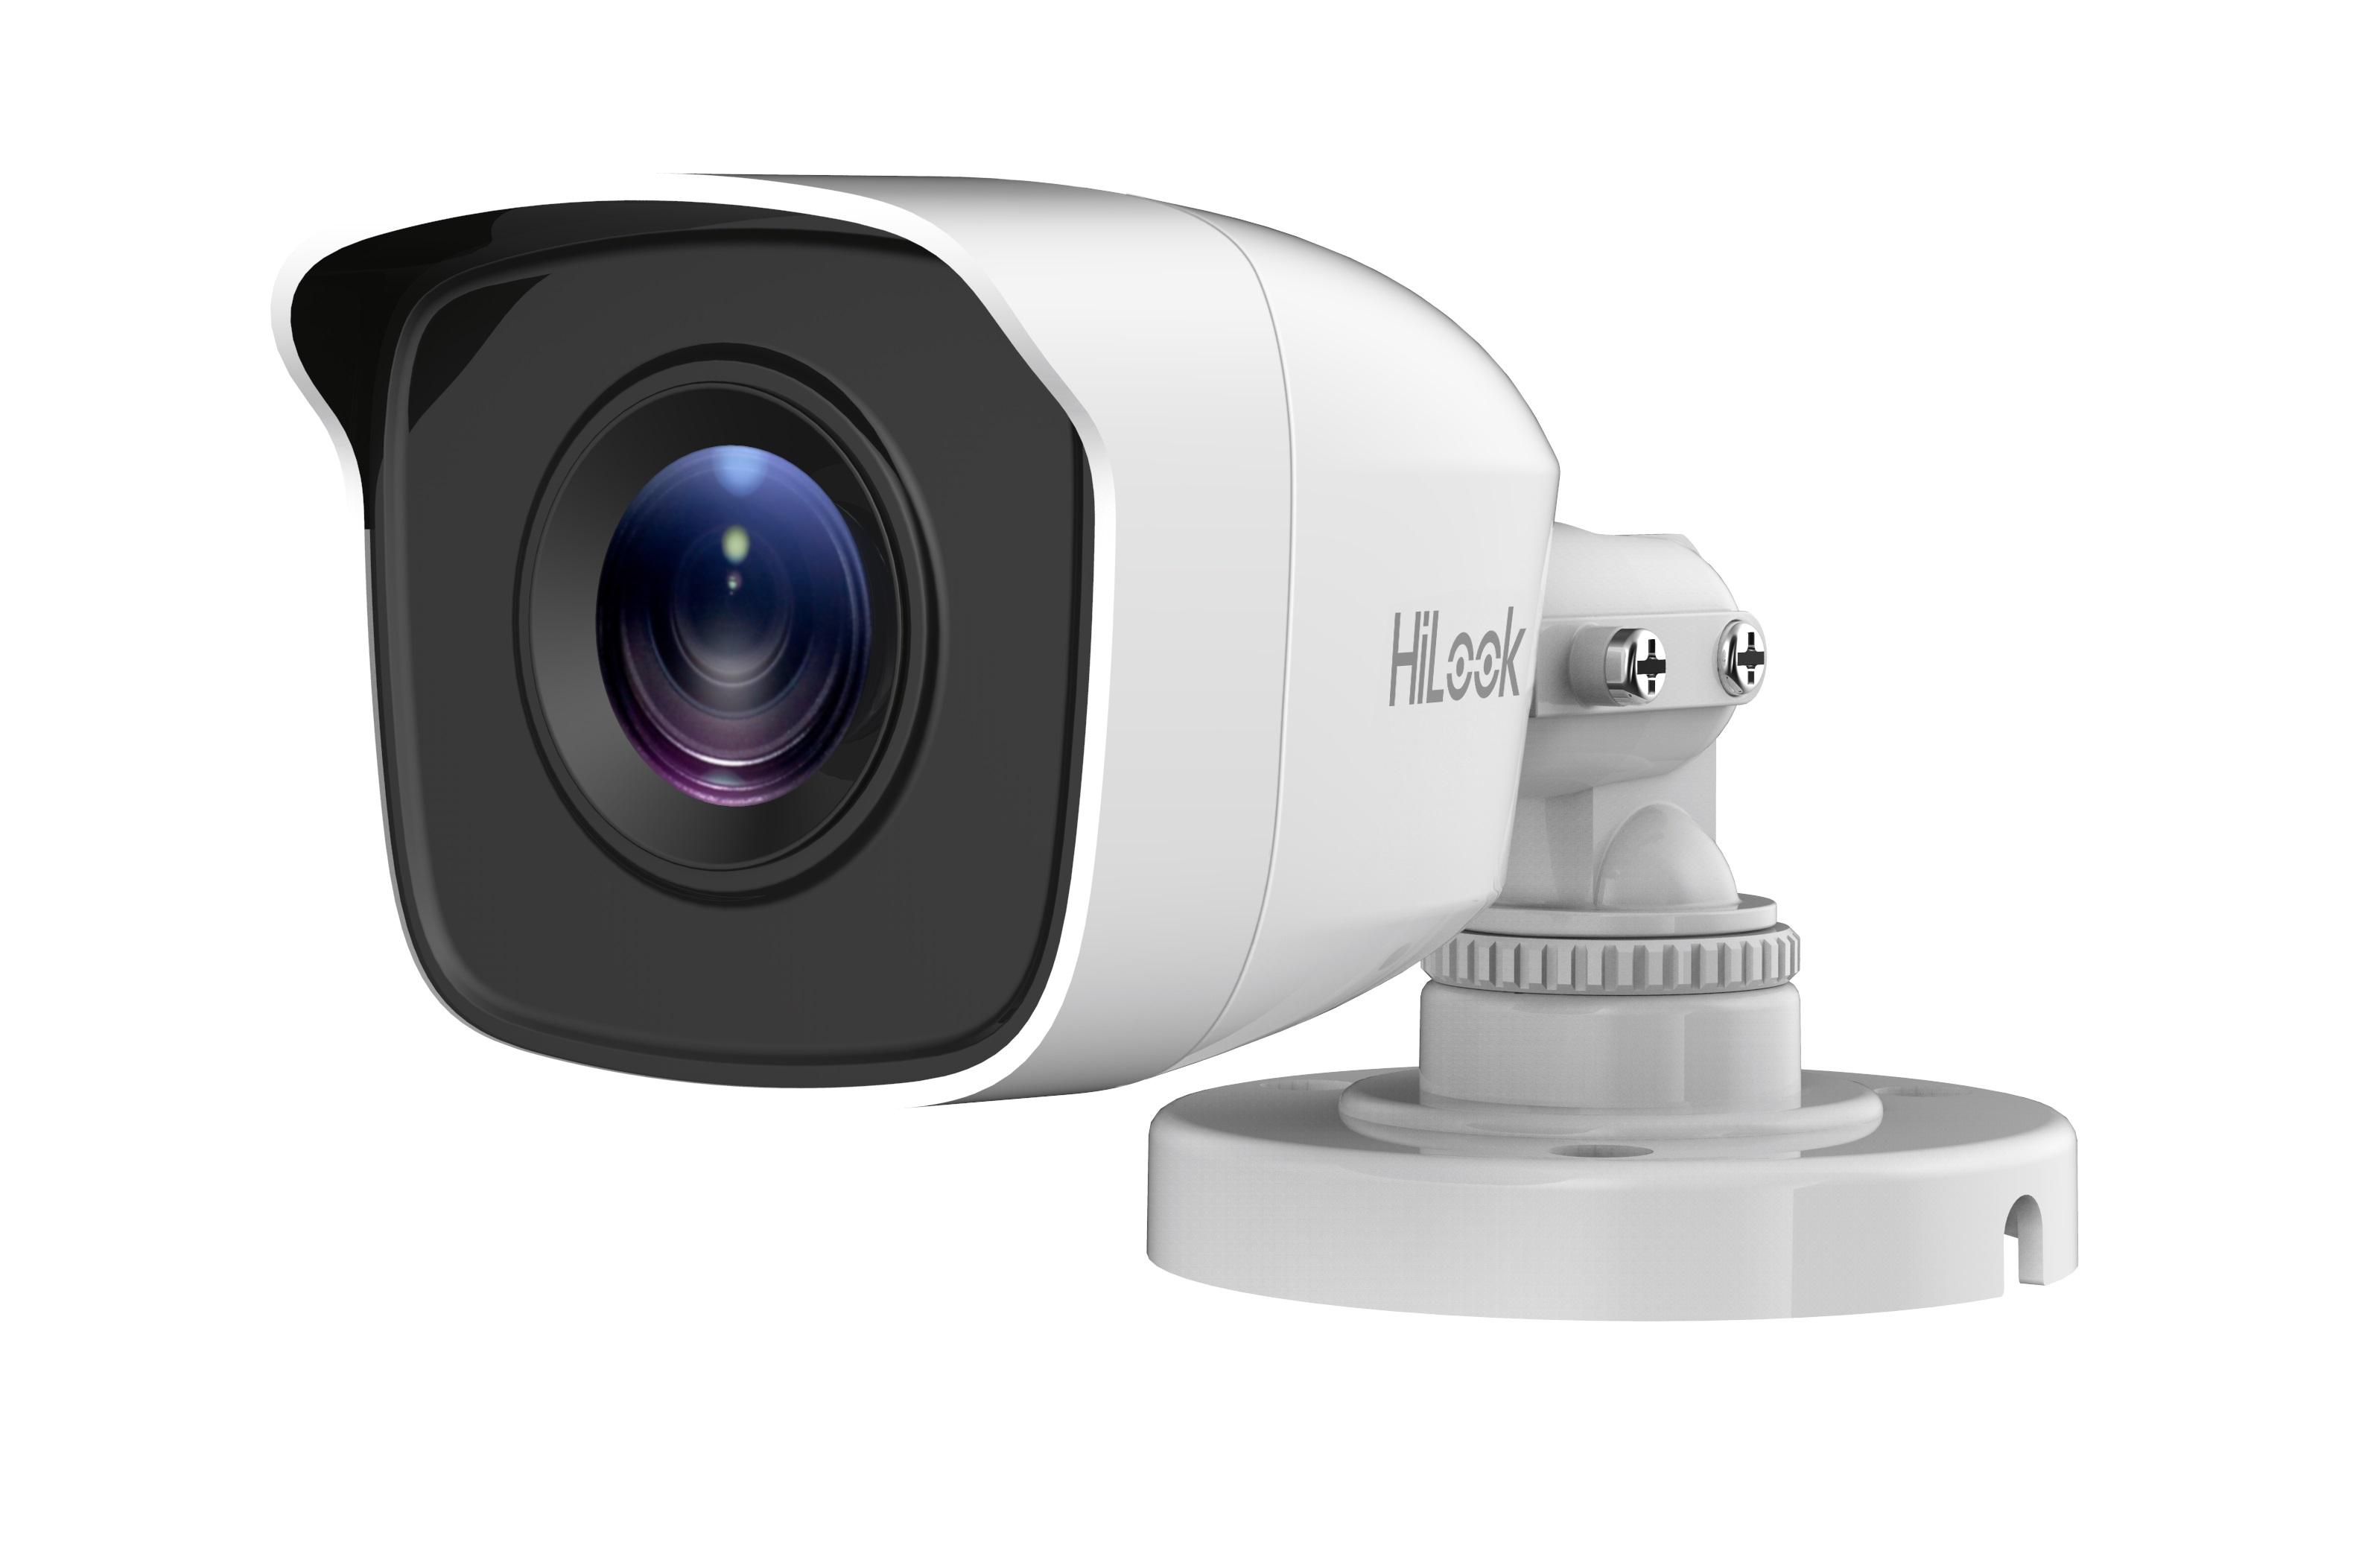 HiLook THC-B150P 5MP 2.8mmmm Turbo HD 25m EXIR Indoor/Outdoor 4-in-1 CCTV Bullet Camera IP66 – White